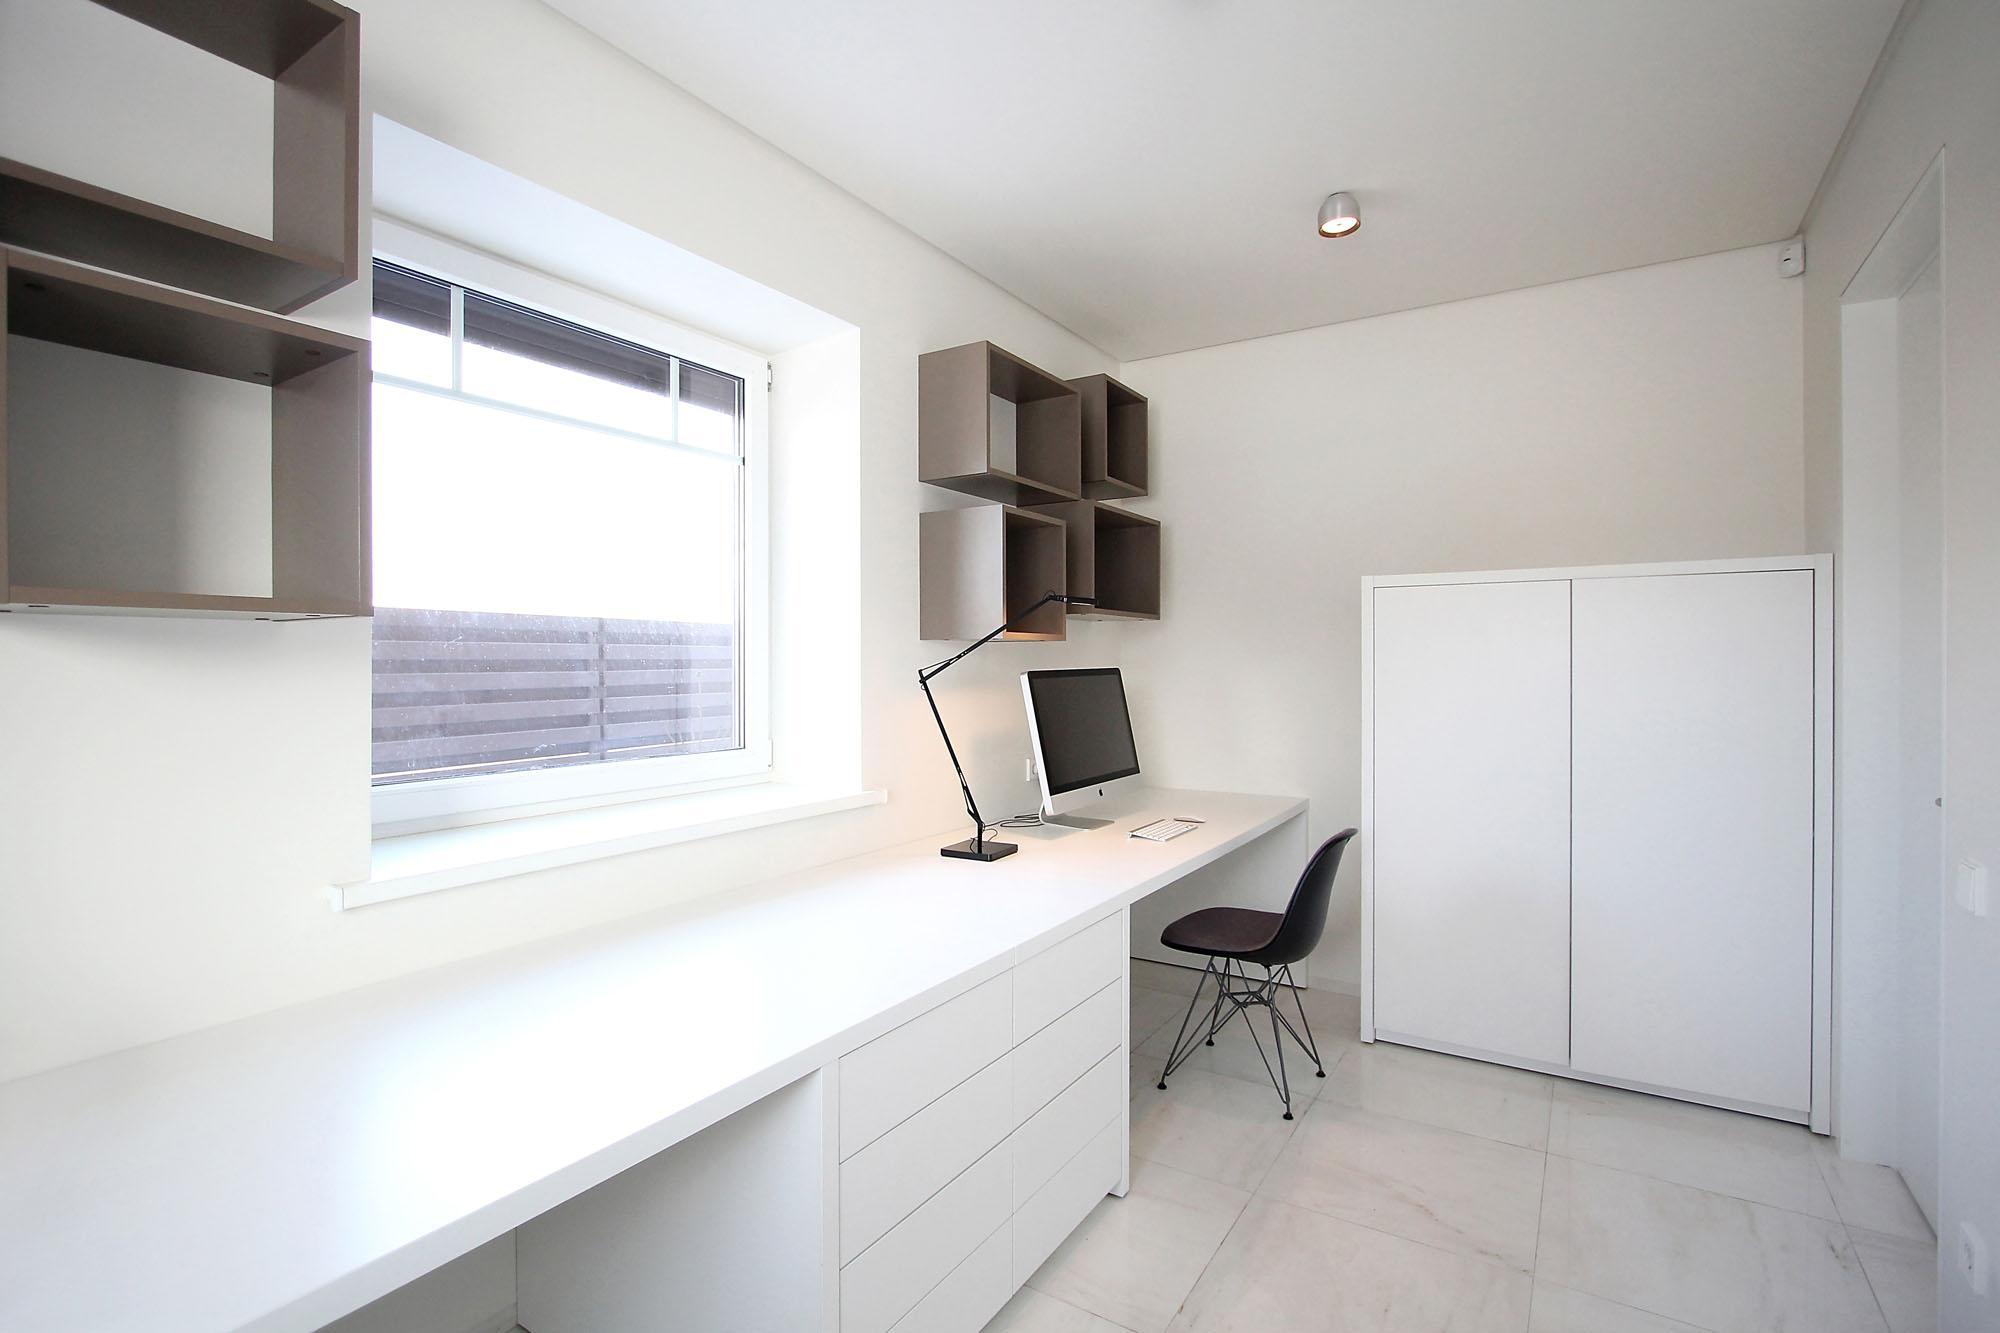 Minimal Style and White Colour Theme of House 02 by Ramunas Manikas-14